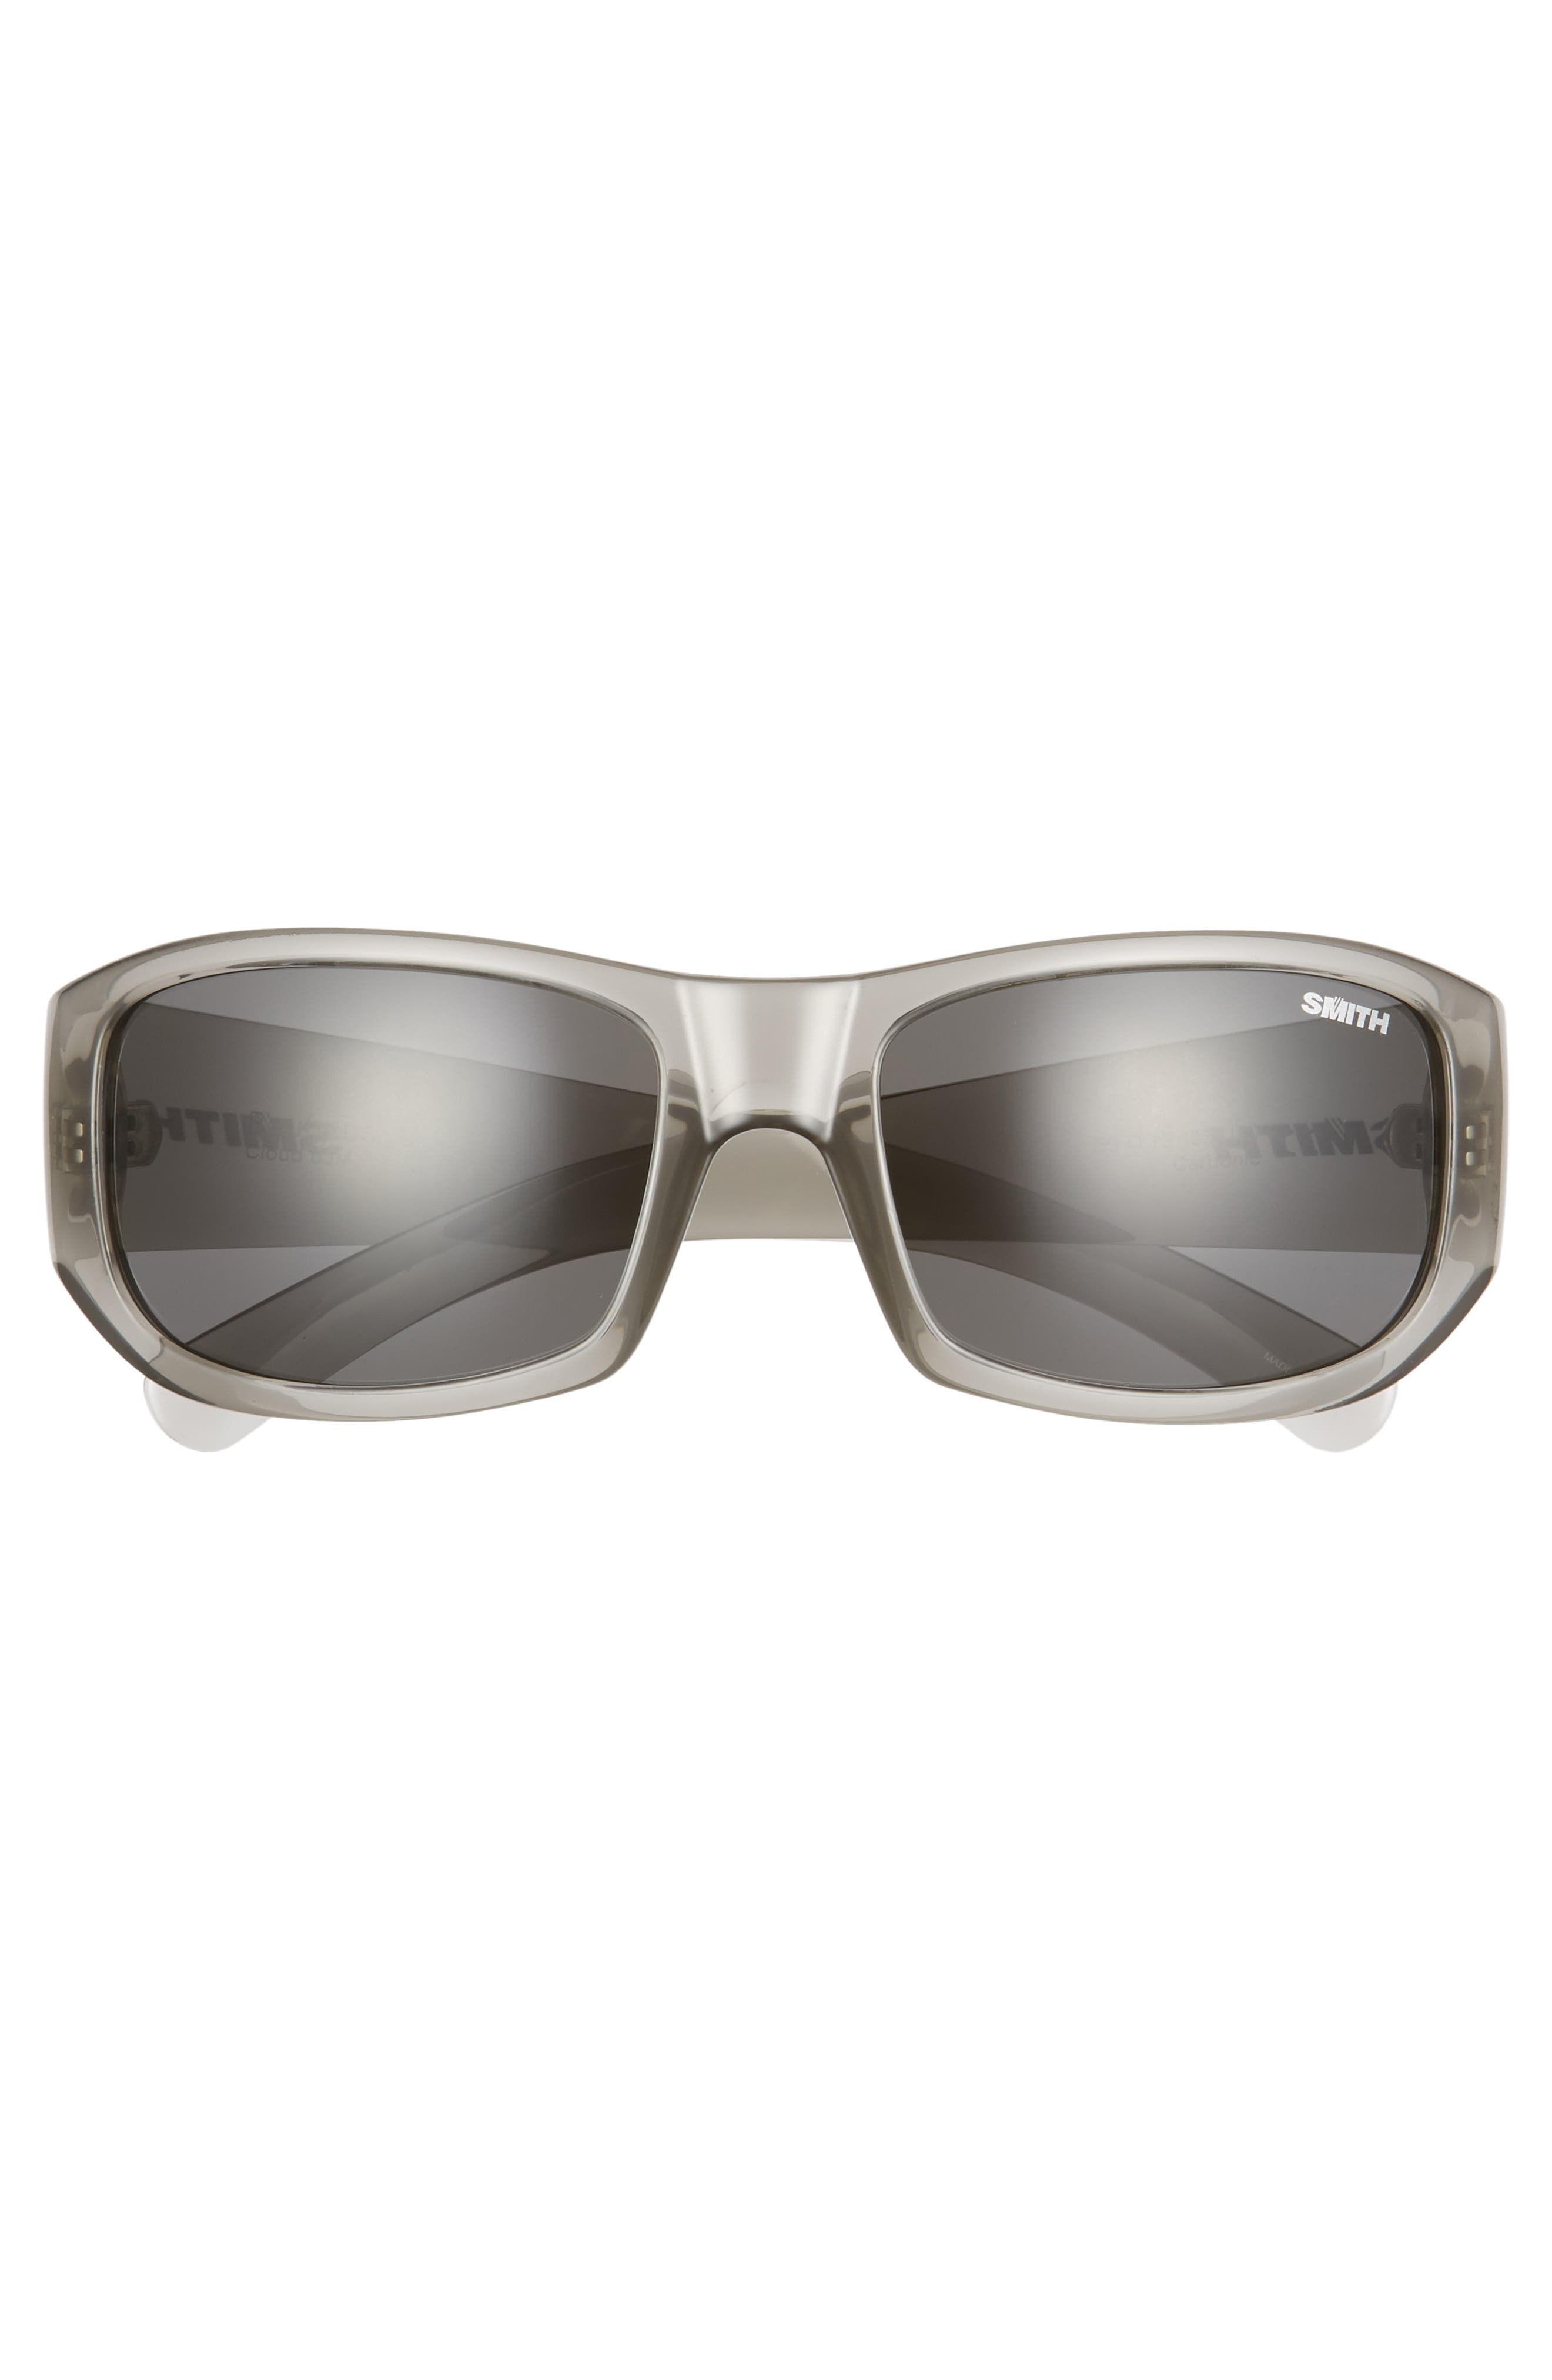 SMITH, Bauhaus 59mm ChromaPop<sup>™</sup> Polarized Wraparound Sunglasses, Alternate thumbnail 3, color, GREY CLOUD/ GREY